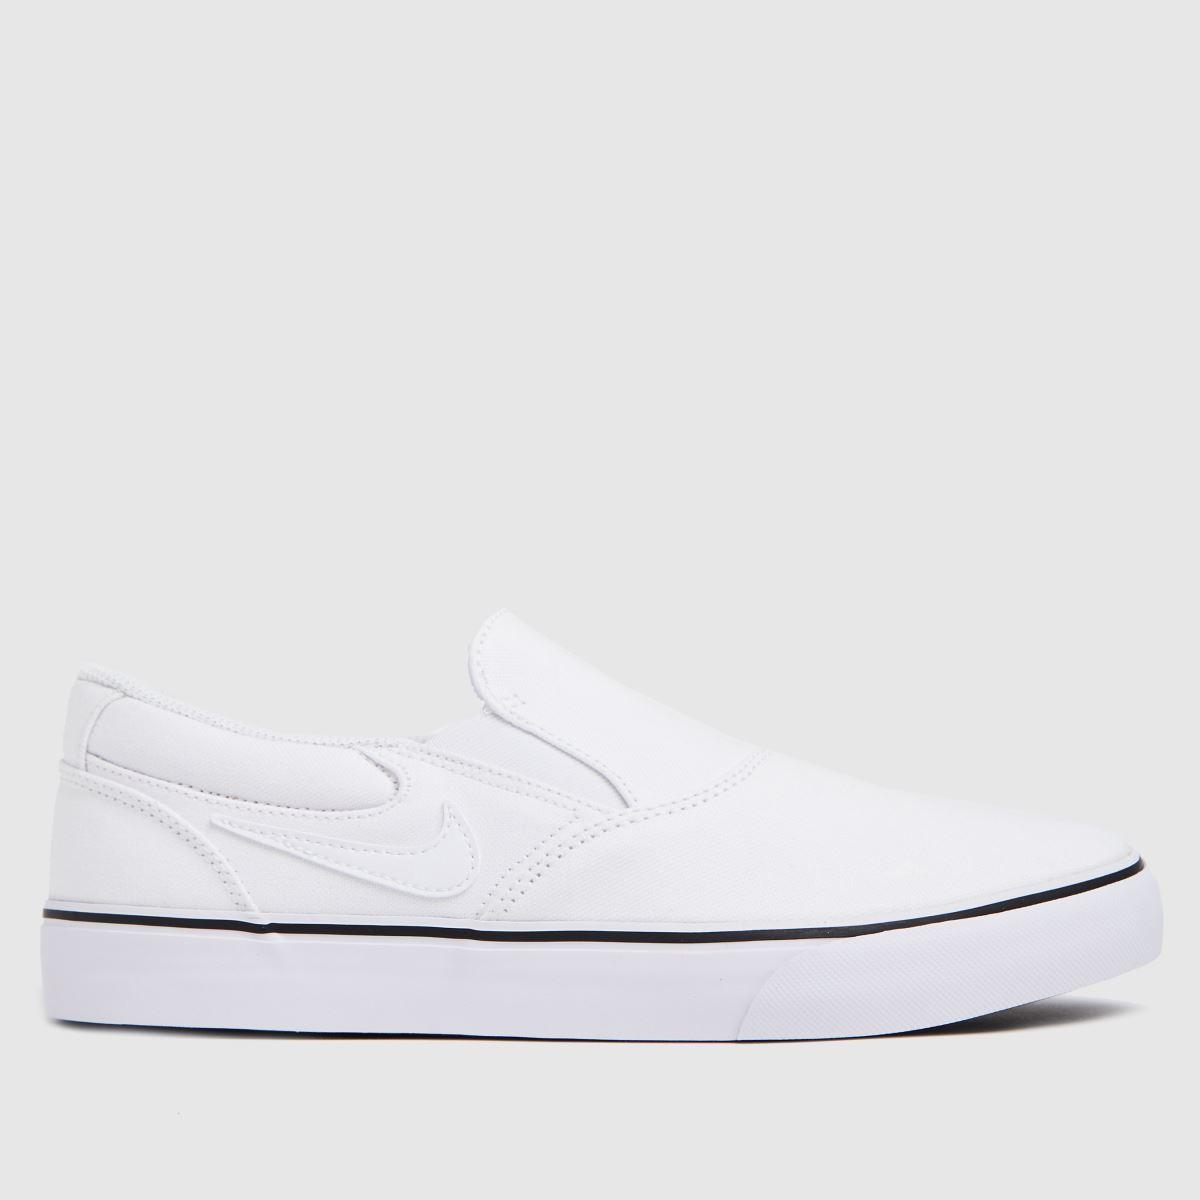 Nike SB White & Black Chron 2 Slip Trainers